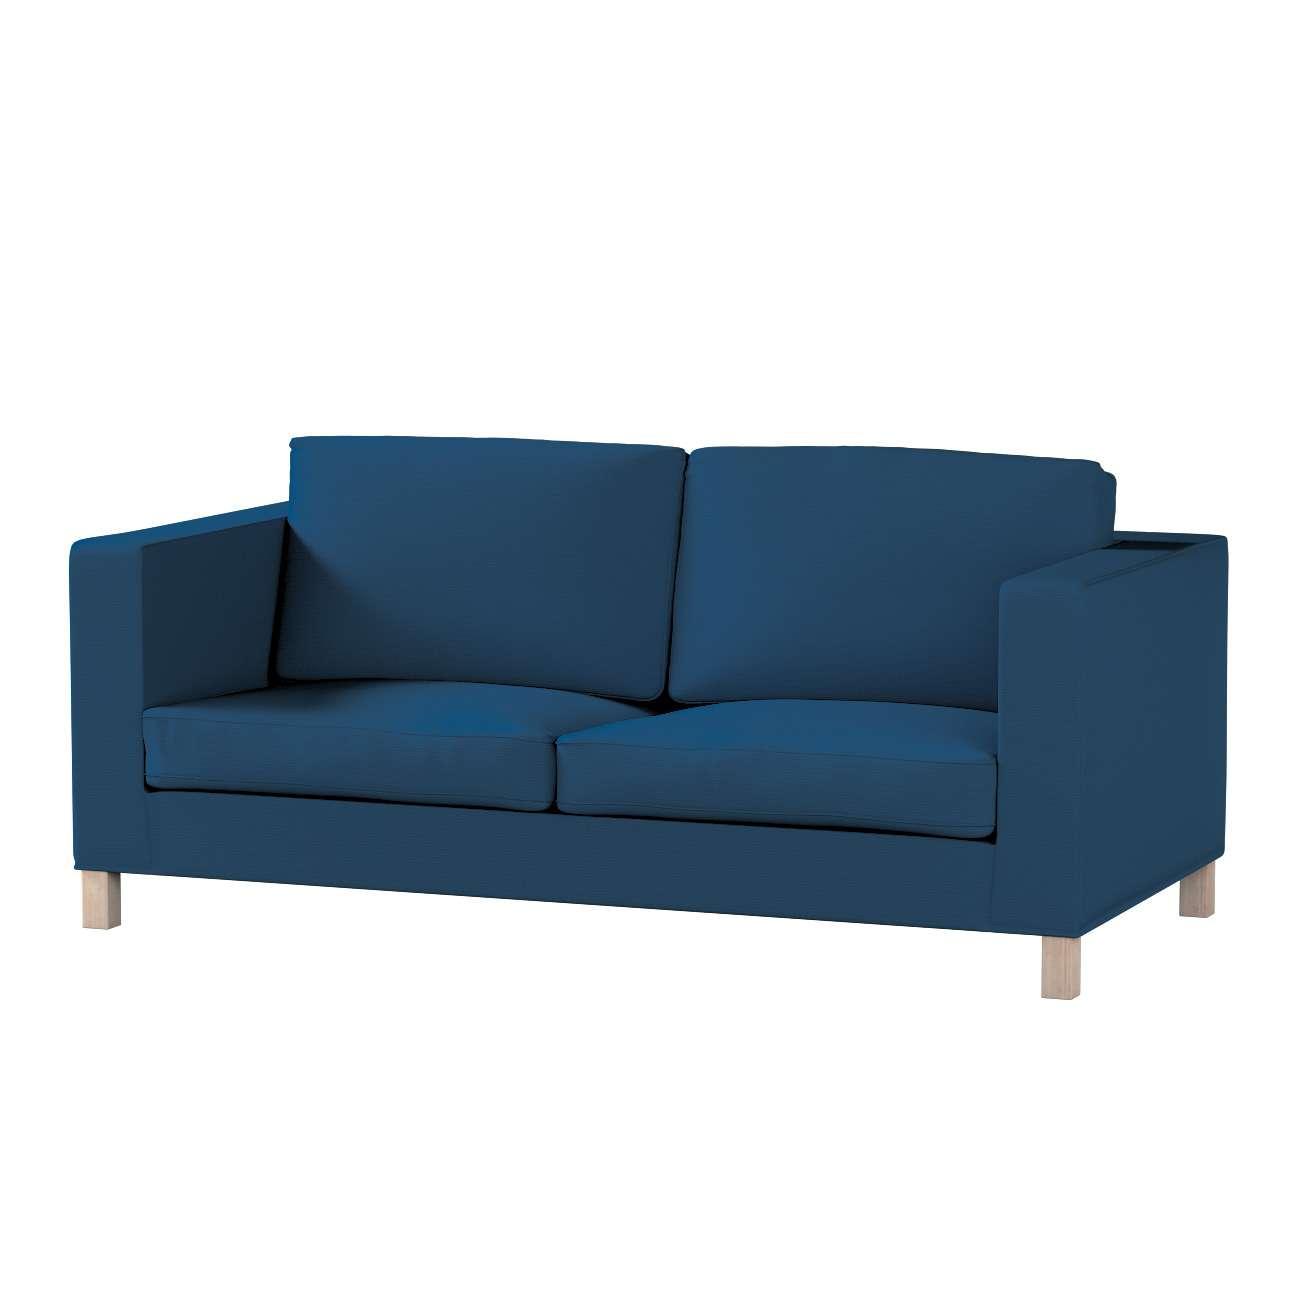 Potah na pohovku IKEA  Karlanda rozkládací, krátký pohovka Karlanda rozkládací v kolekci Cotton Panama, látka: 702-30